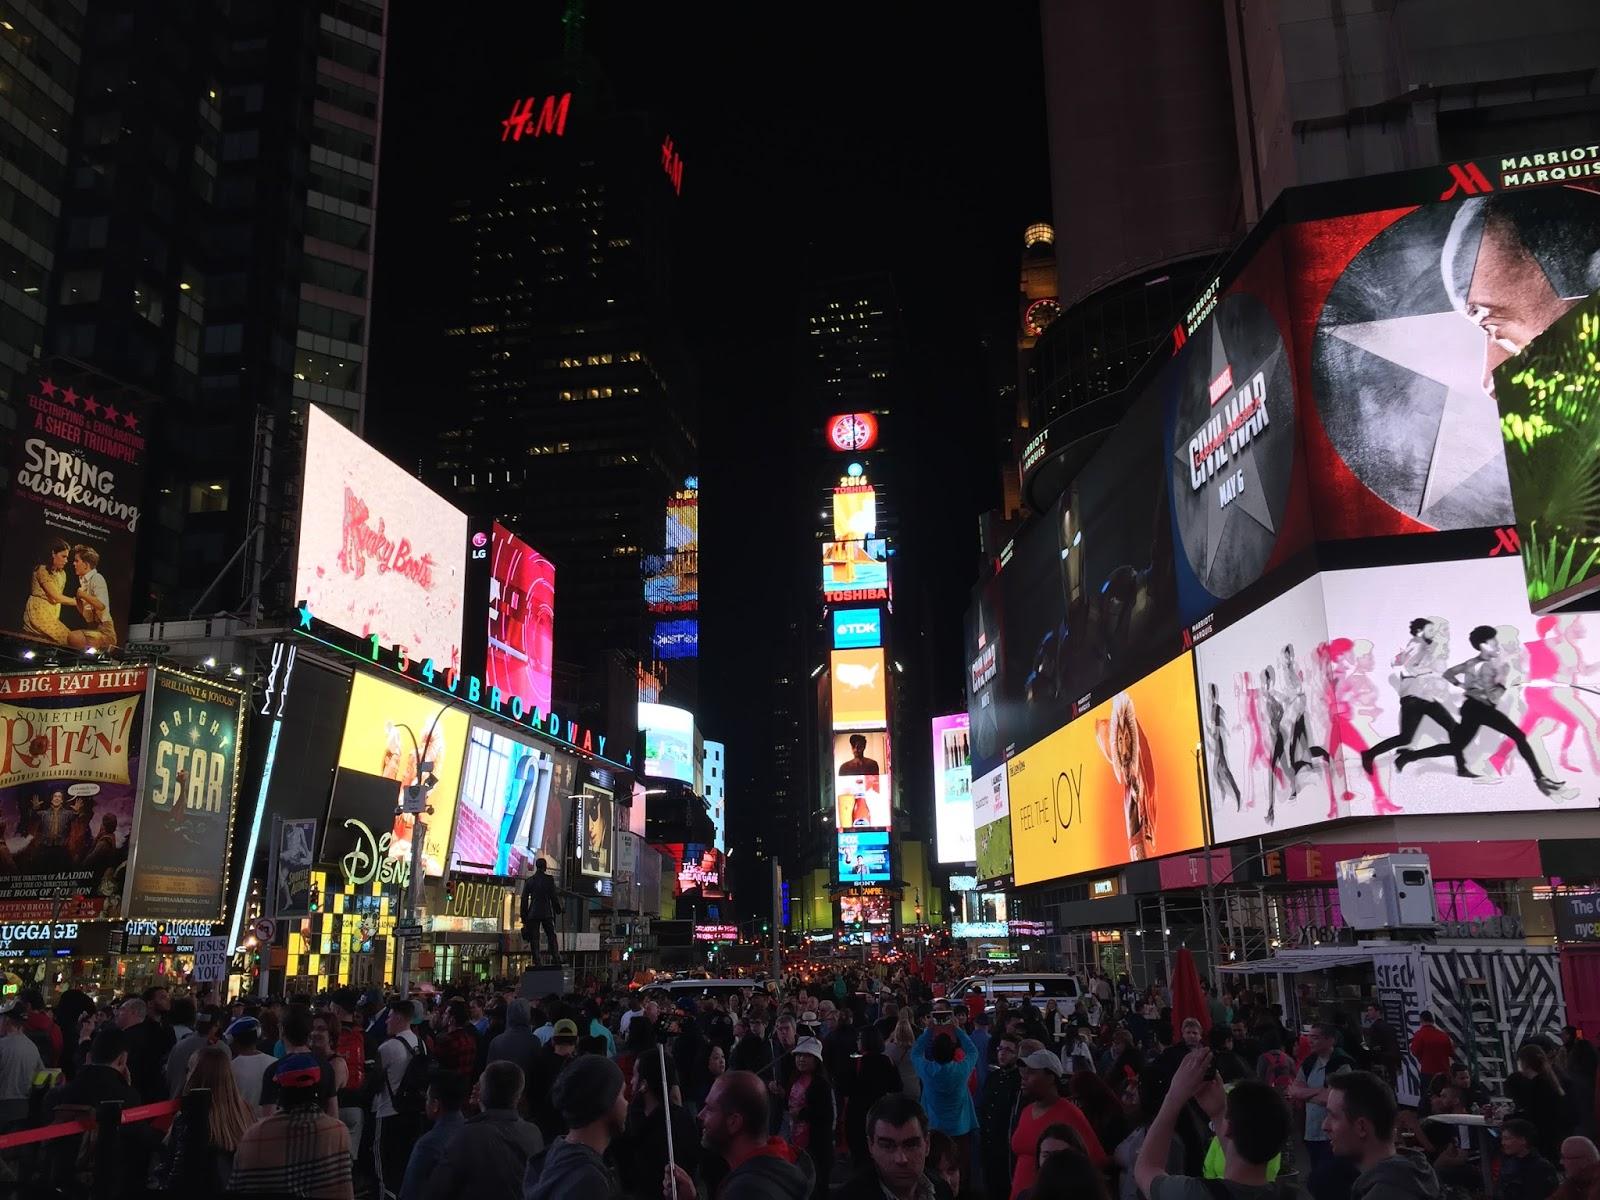 blog travel post blogger nyc new york city central park ceetiz cours survie tom met metropolitan museum art times square by night cherry blossom spring voyage holidays les gommettes de melo gomette